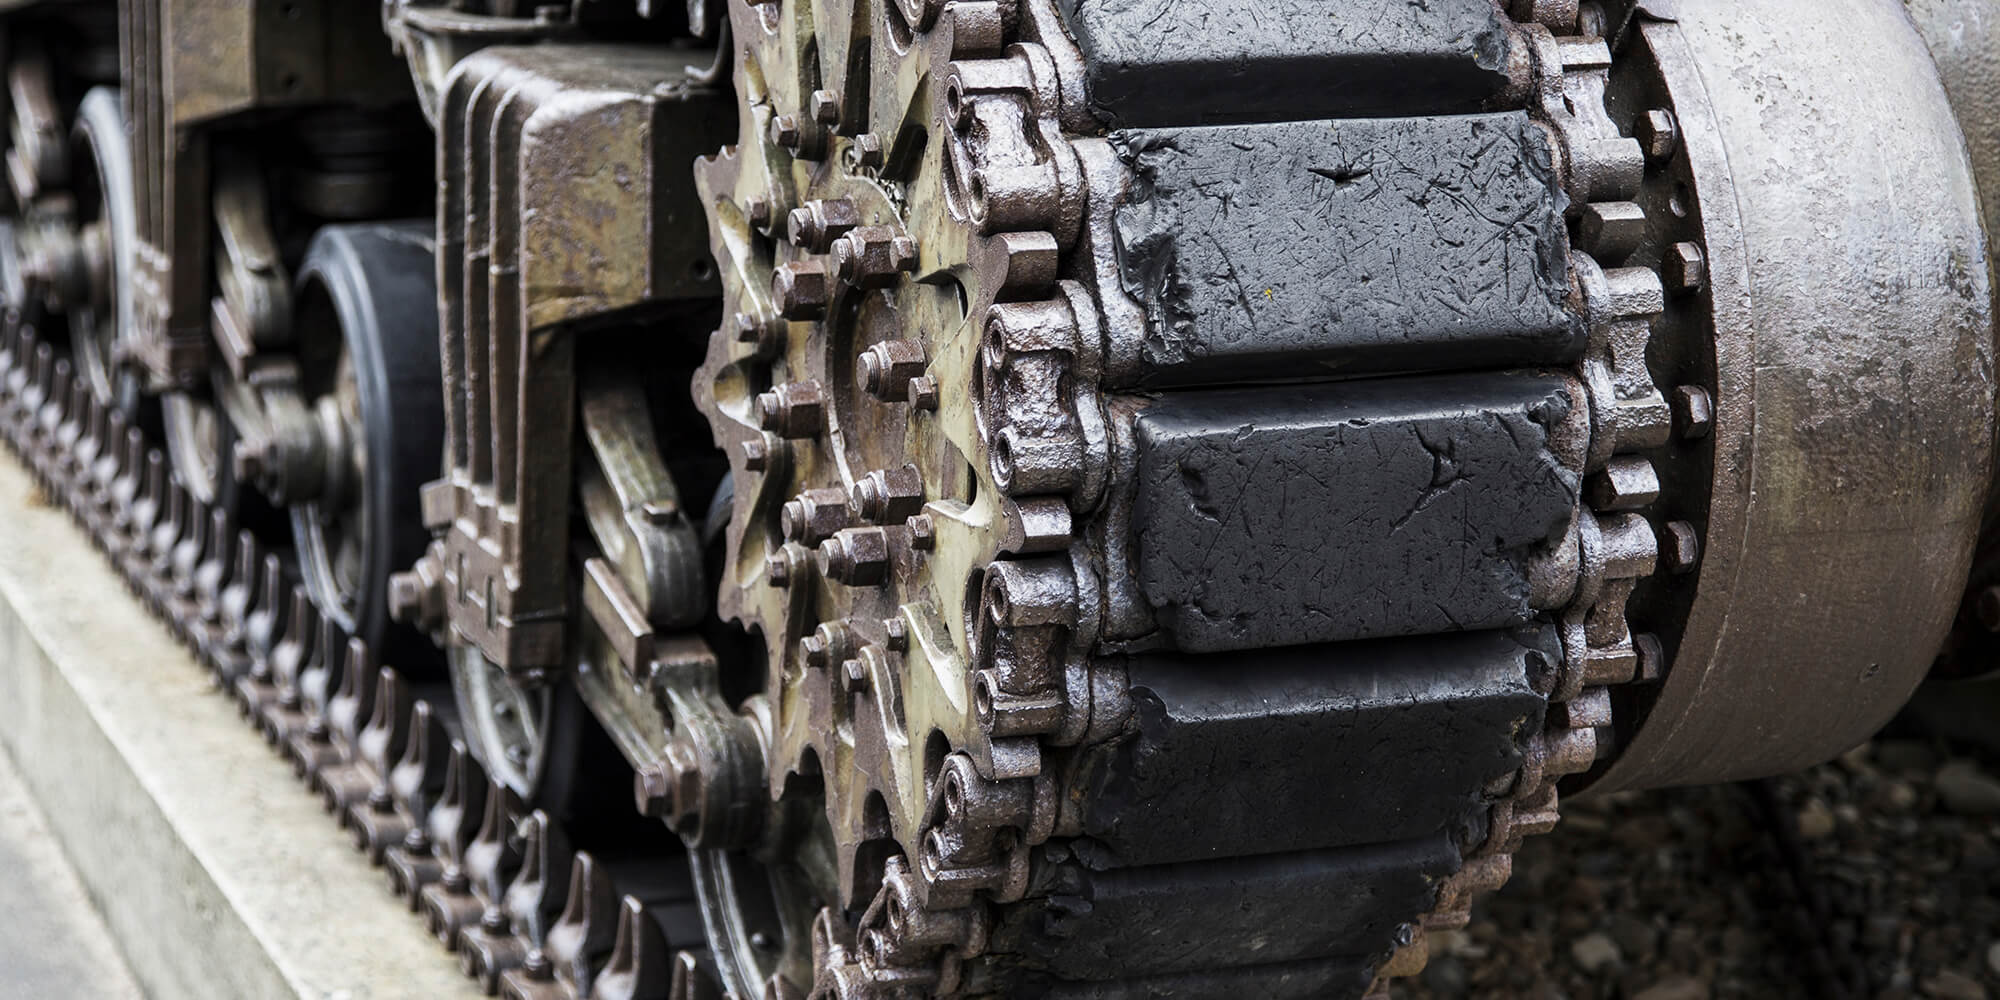 A World War 2 tank